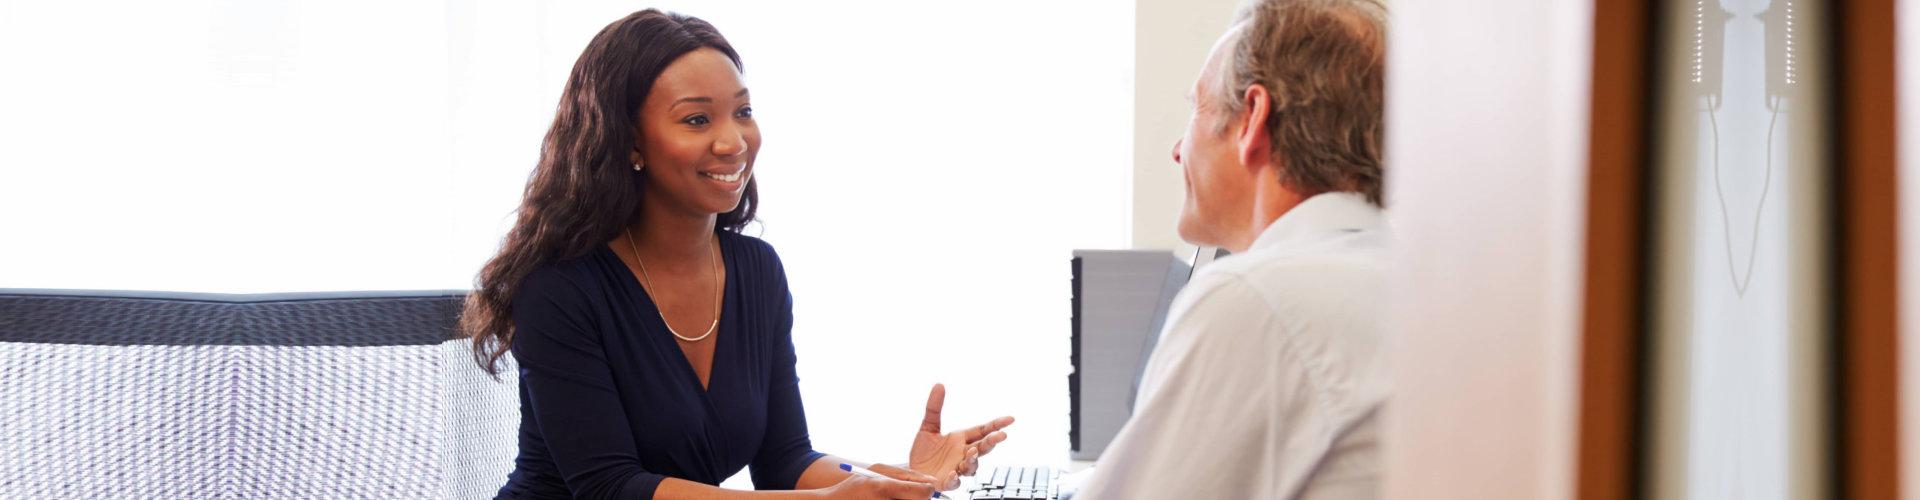 a woman and an elderly man talking